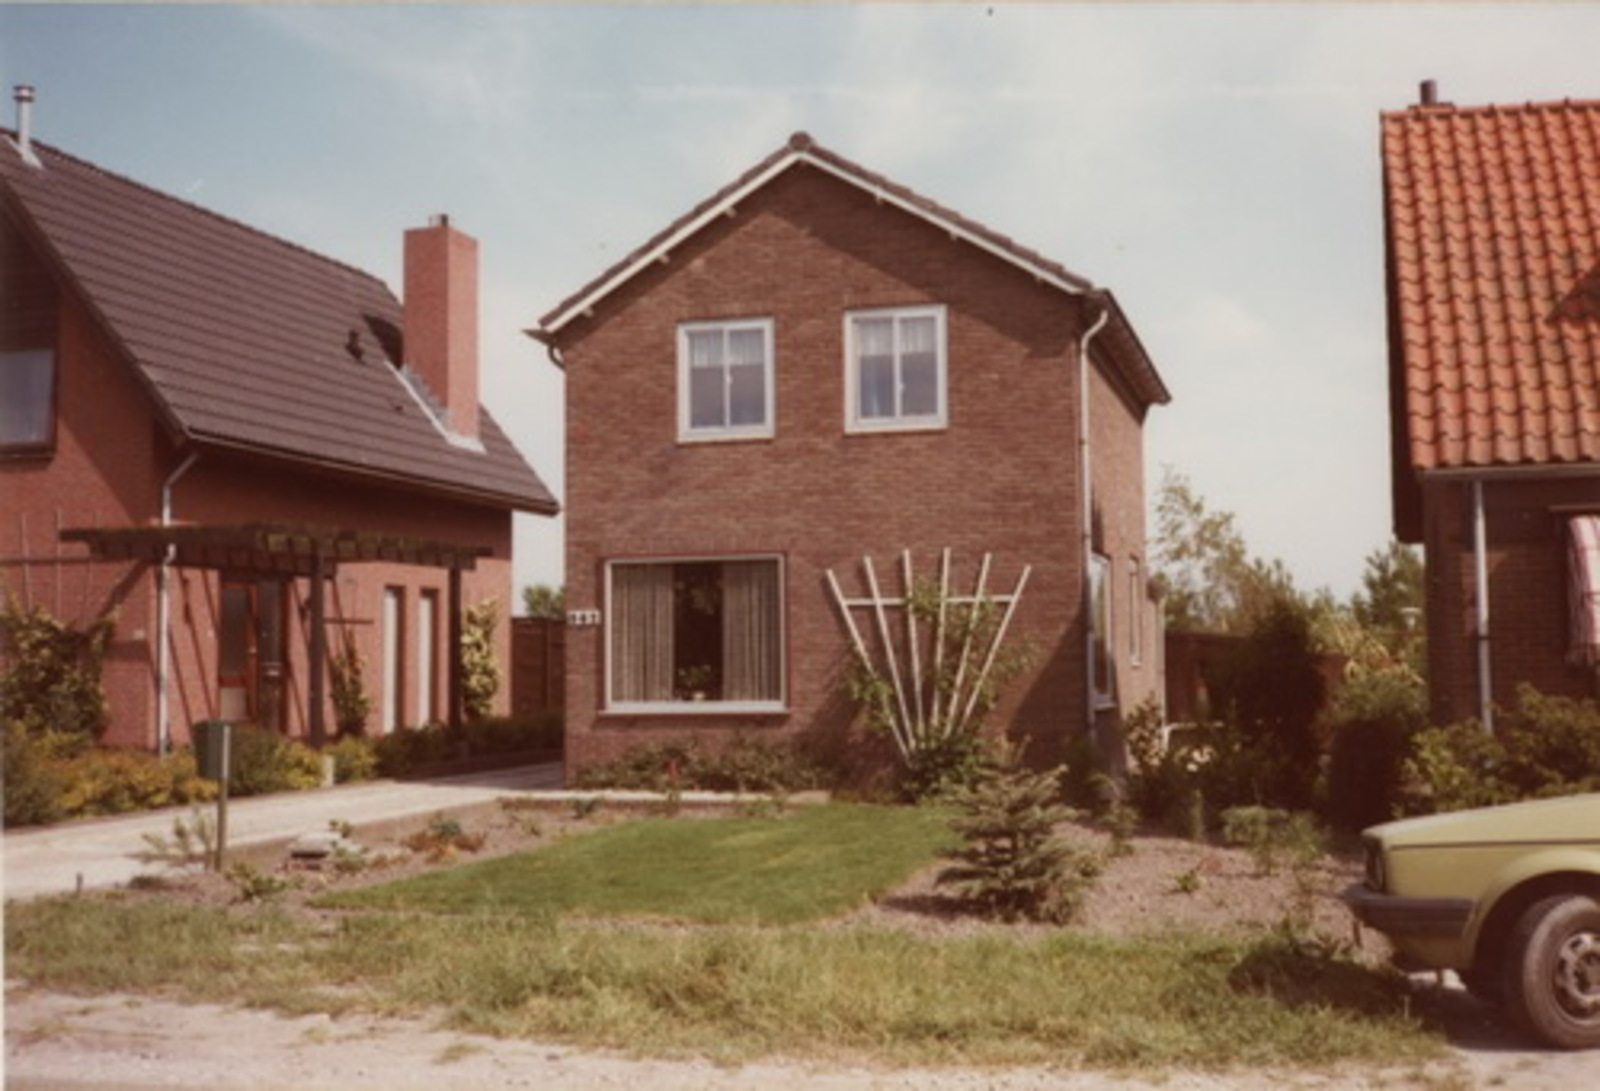 IJweg O 0962 1983 Huize Jan Stolwijk